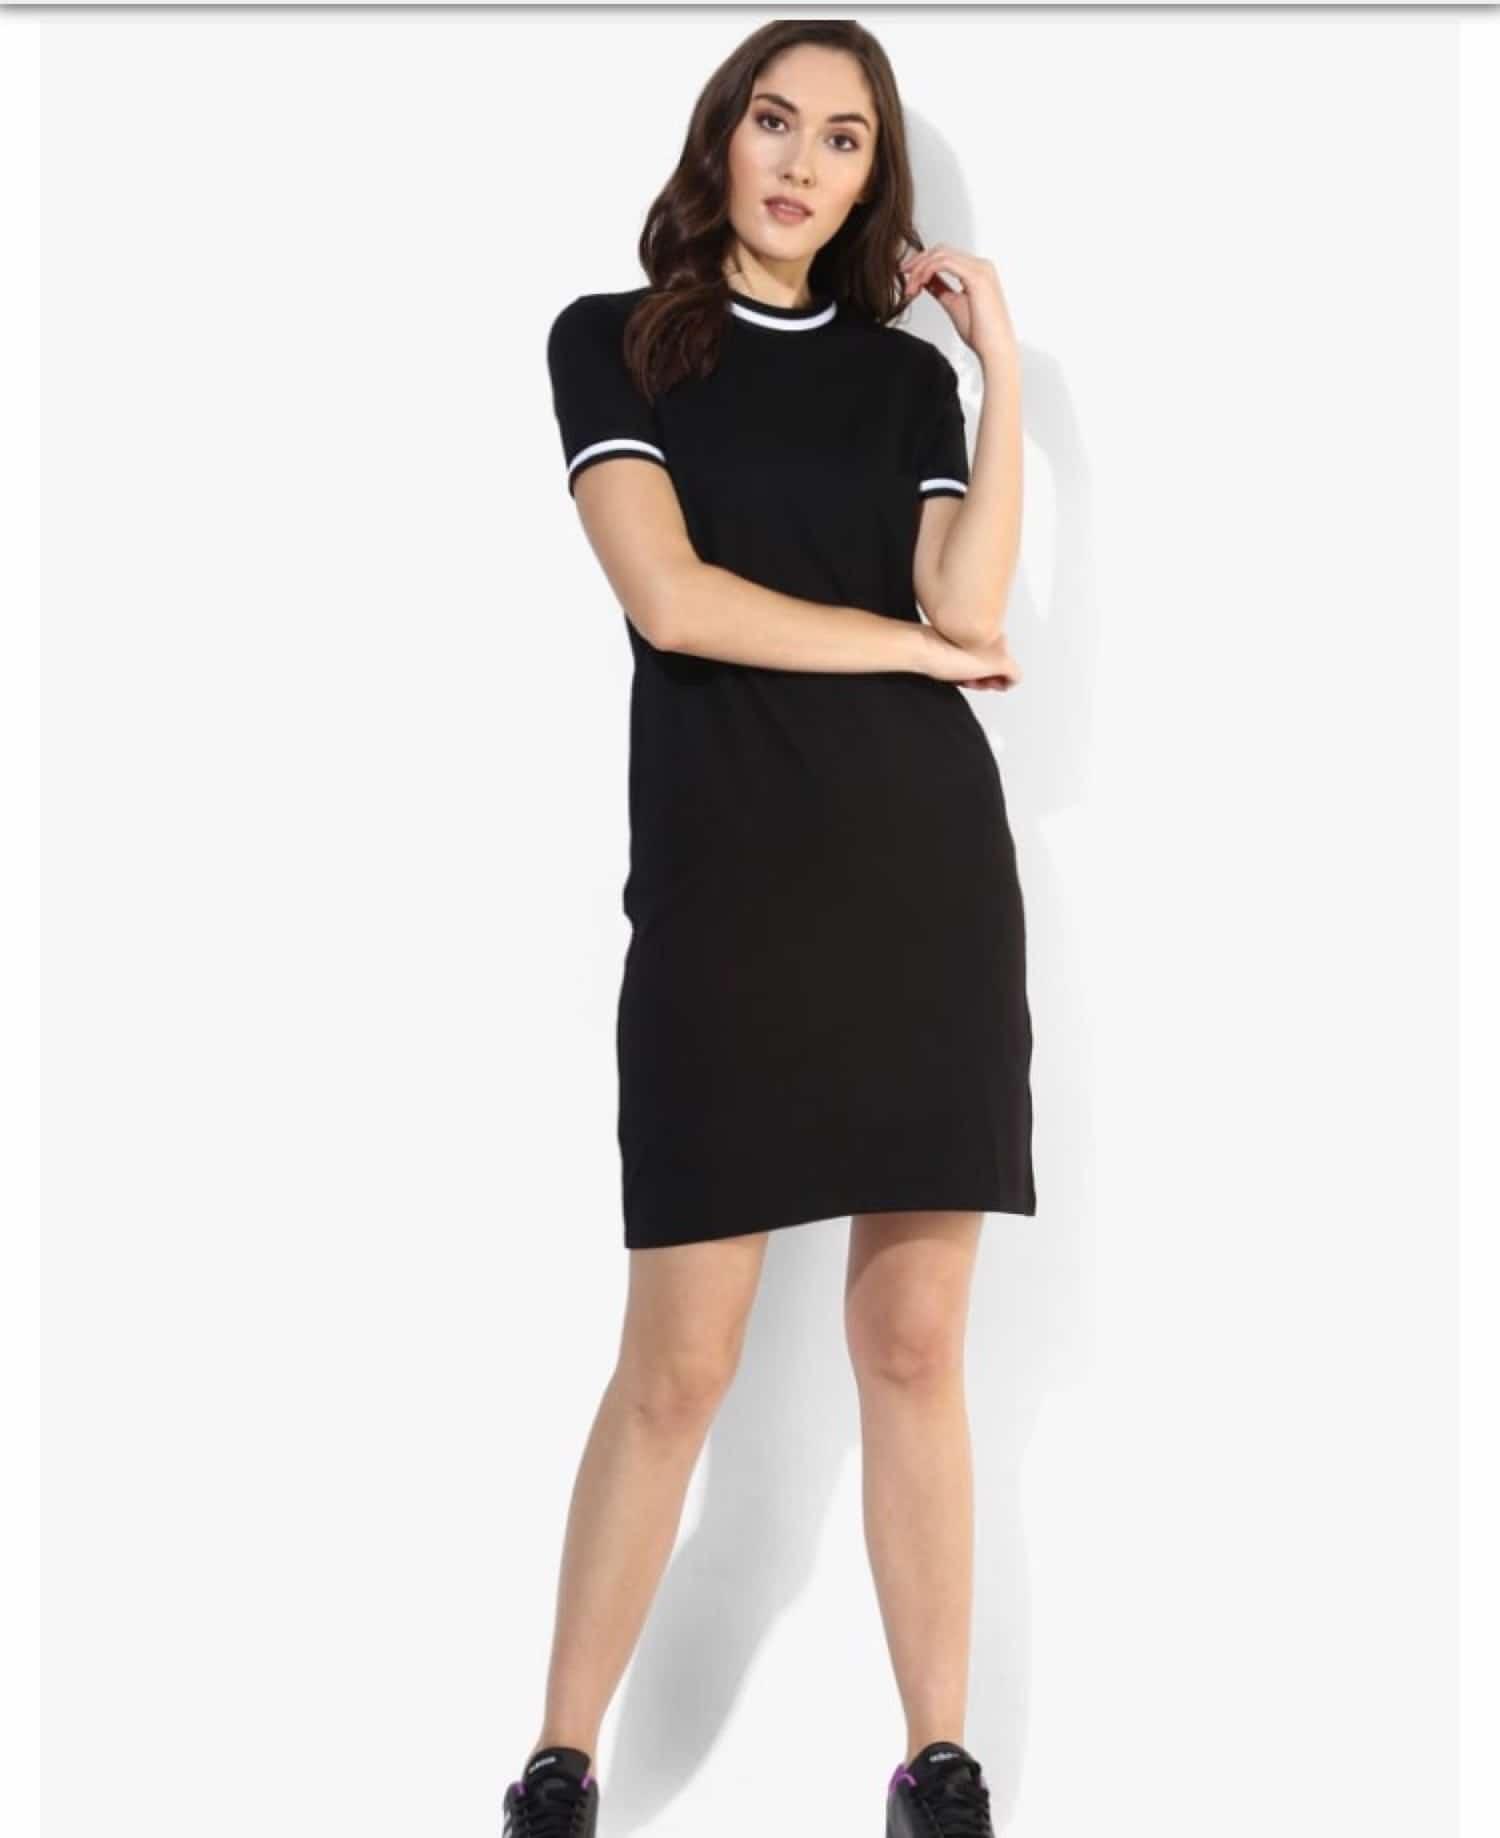 Sporty Dress ₹799 only #blacksportydress #western-dress #dressonline #womendressesonline #blackdress #blackloveforever  #sportydress